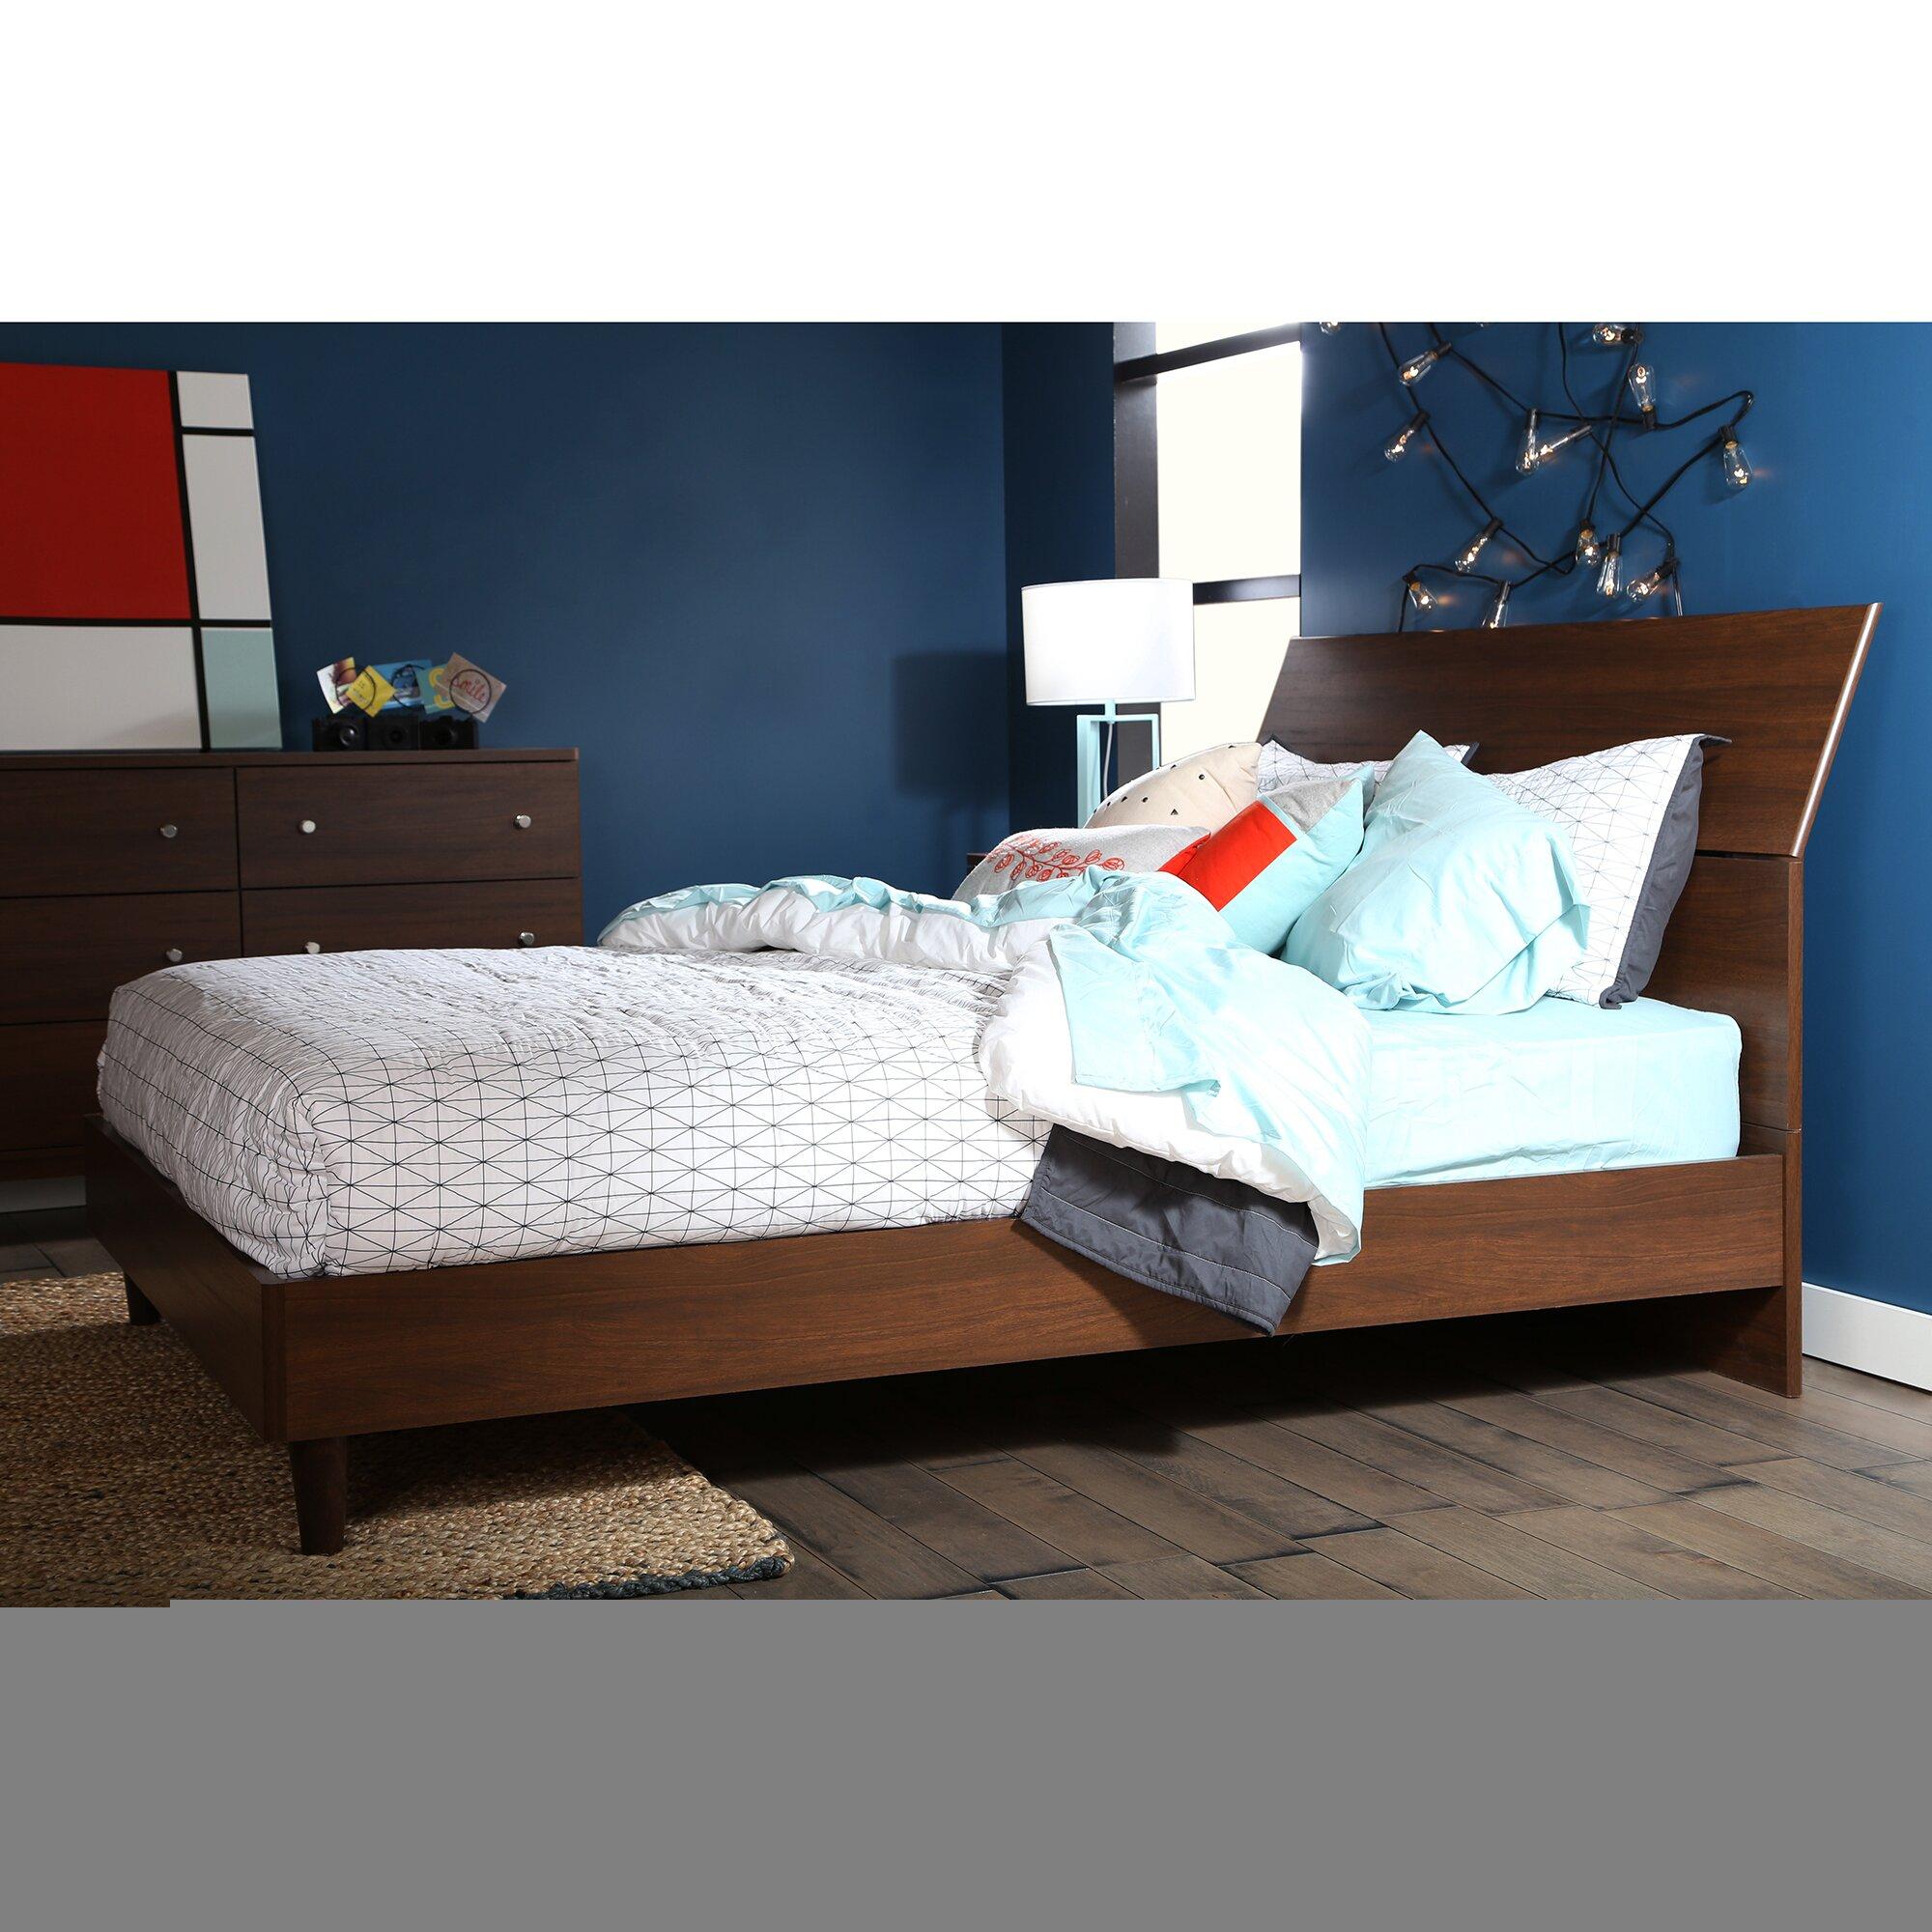 south shore olly queen platform customizable bedroom set reviews wayfair. Black Bedroom Furniture Sets. Home Design Ideas